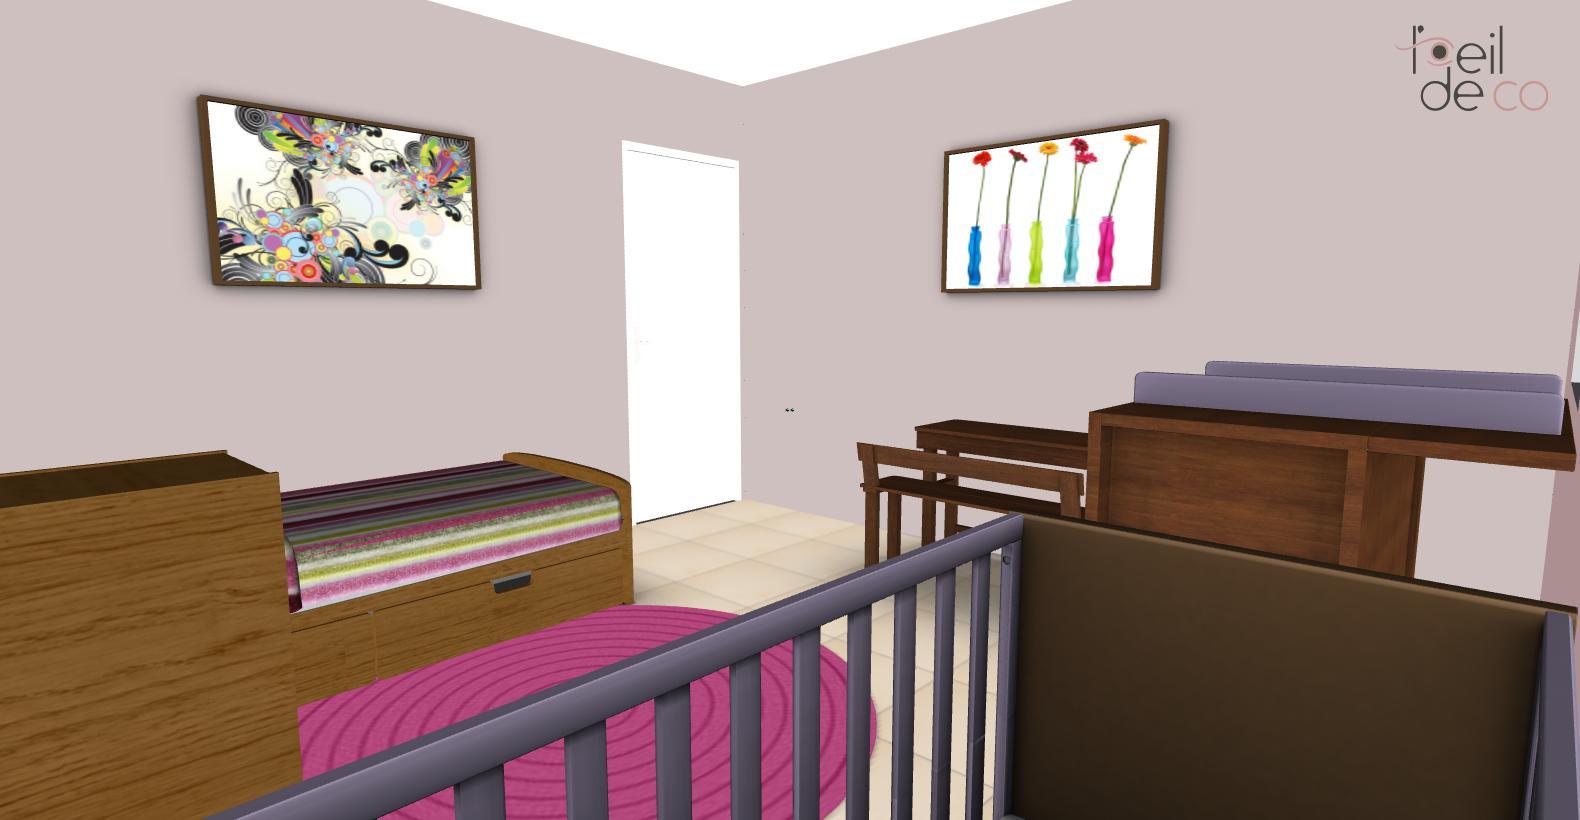 18-Chambre enfant3